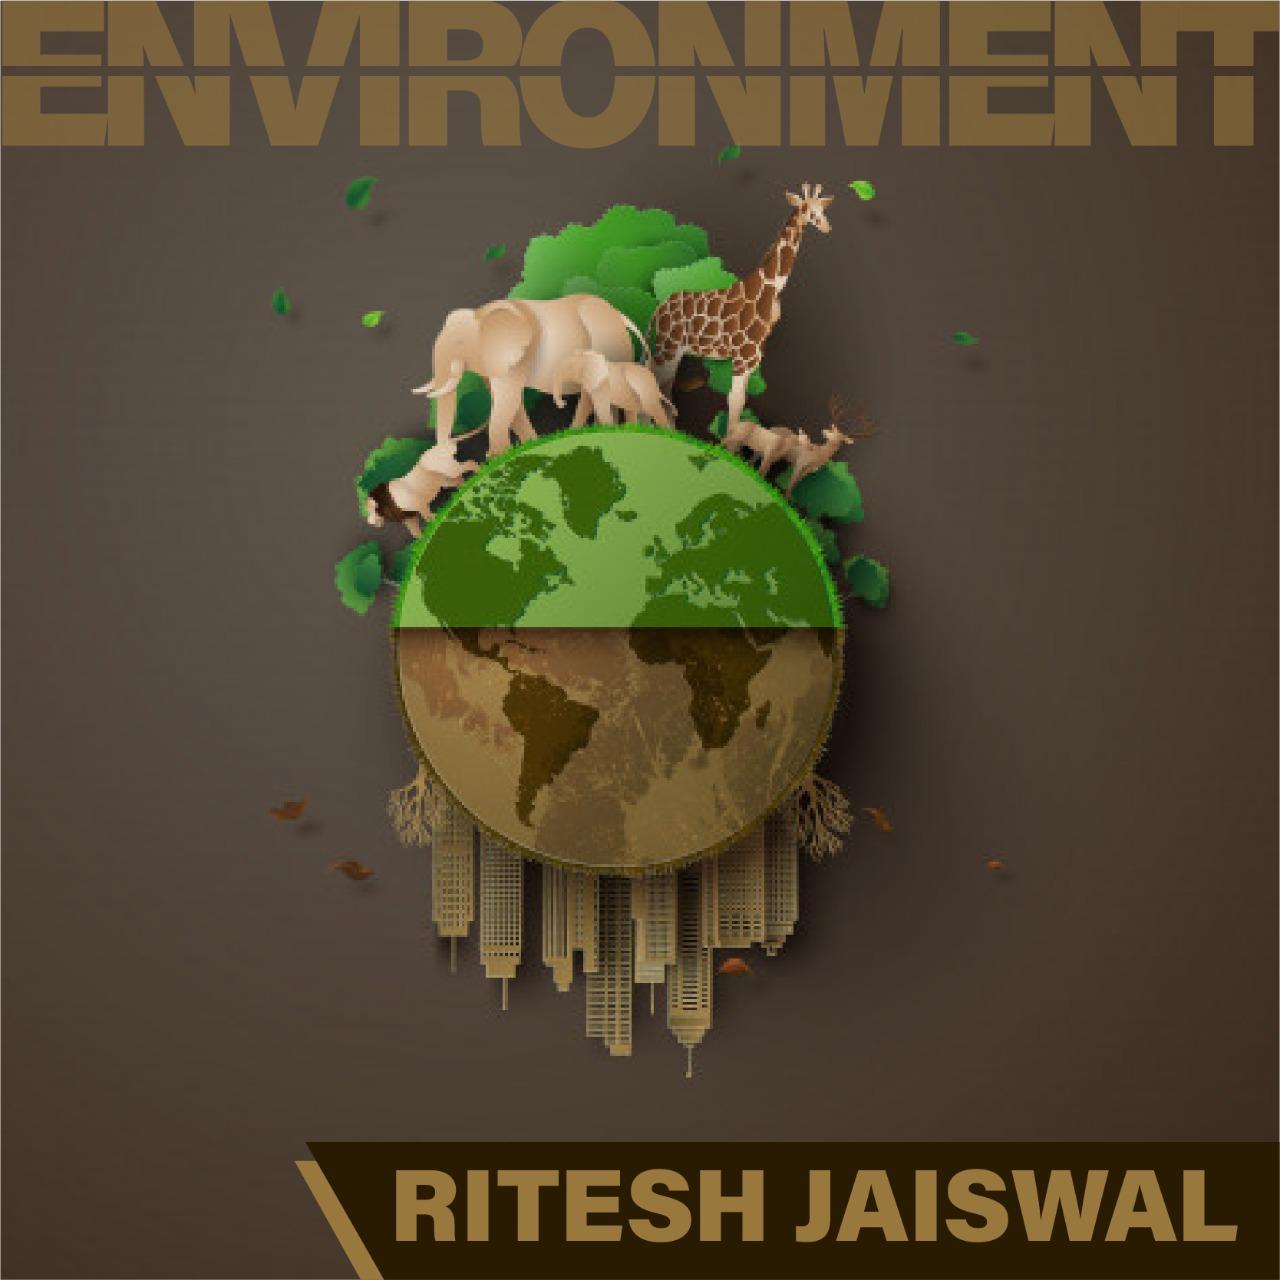 Ritesh Jaiswal - ECOLOGY & ENVIRONMENT